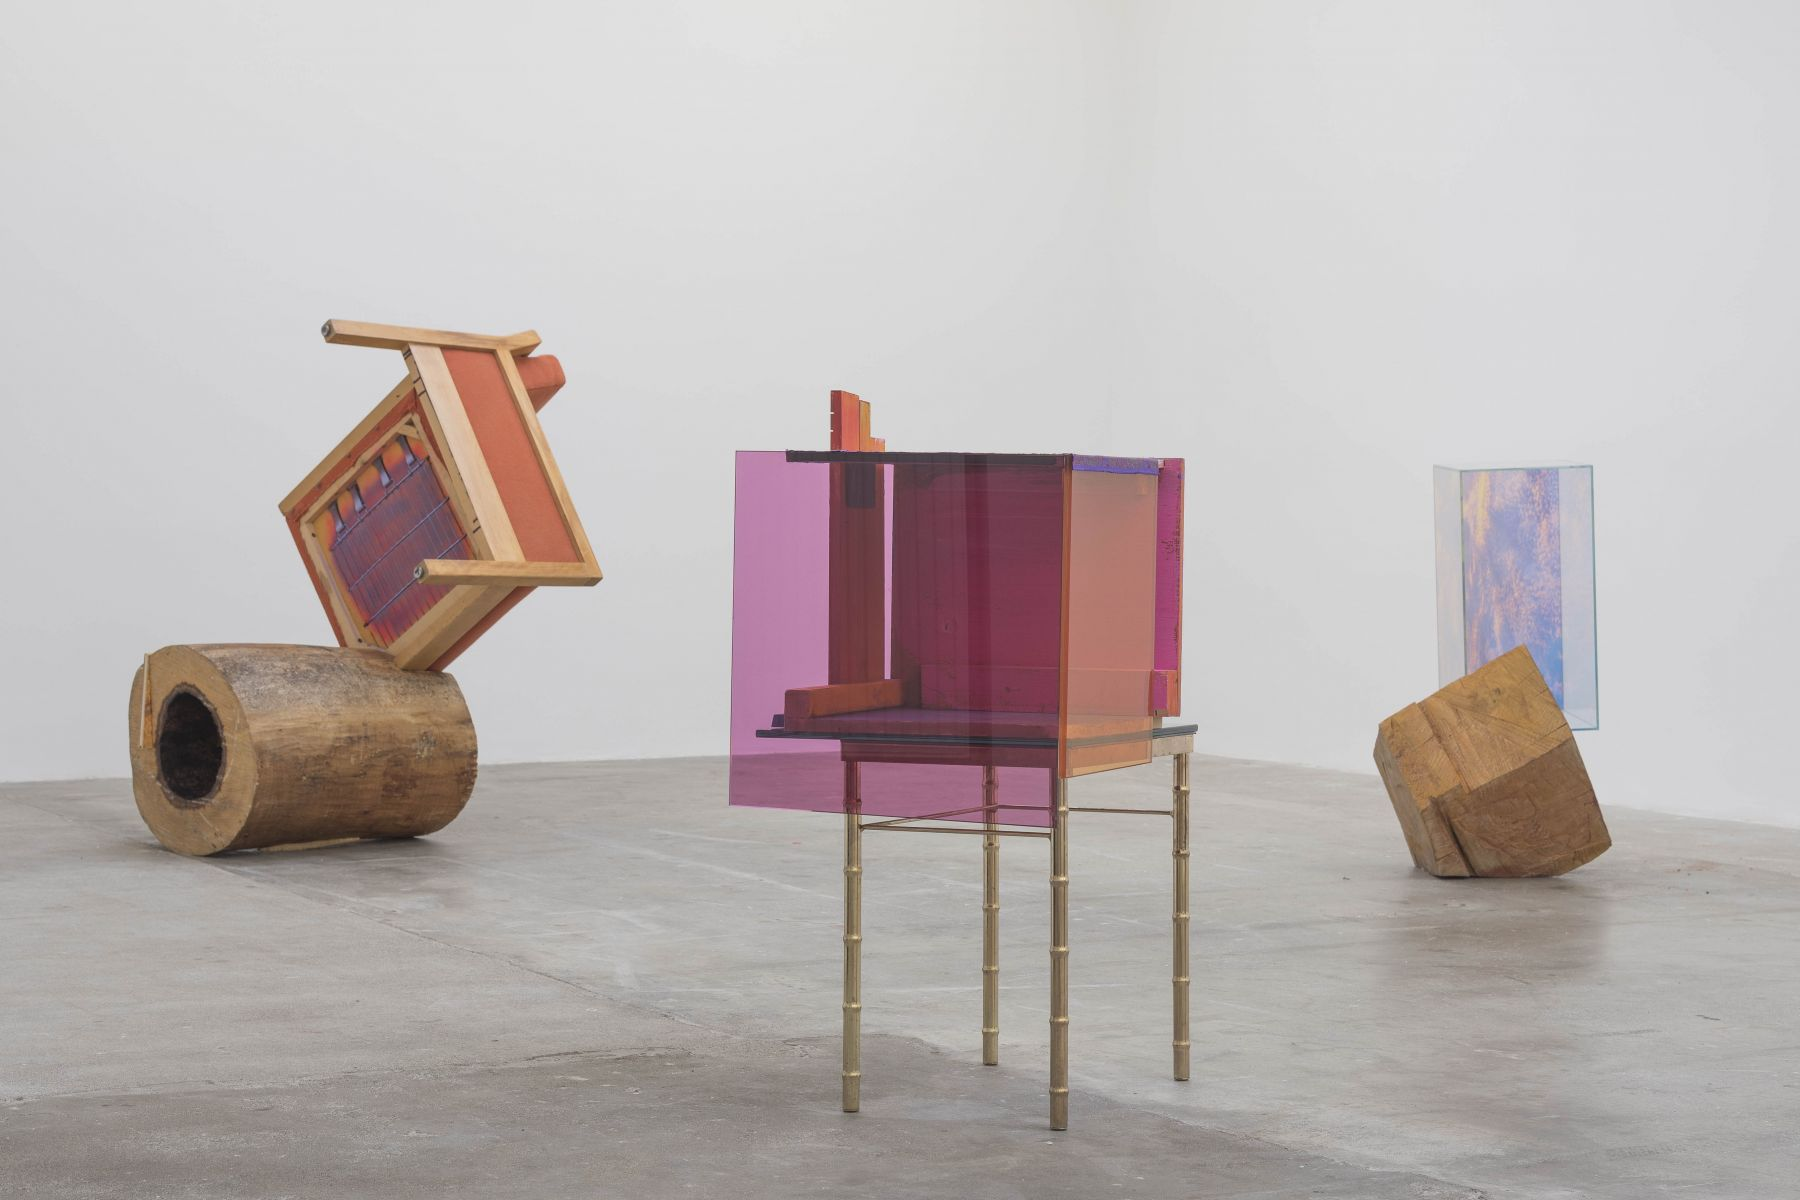 , Exhibition view Sarah BramanIn Spite of Ourselves,LinnLühn2017/18